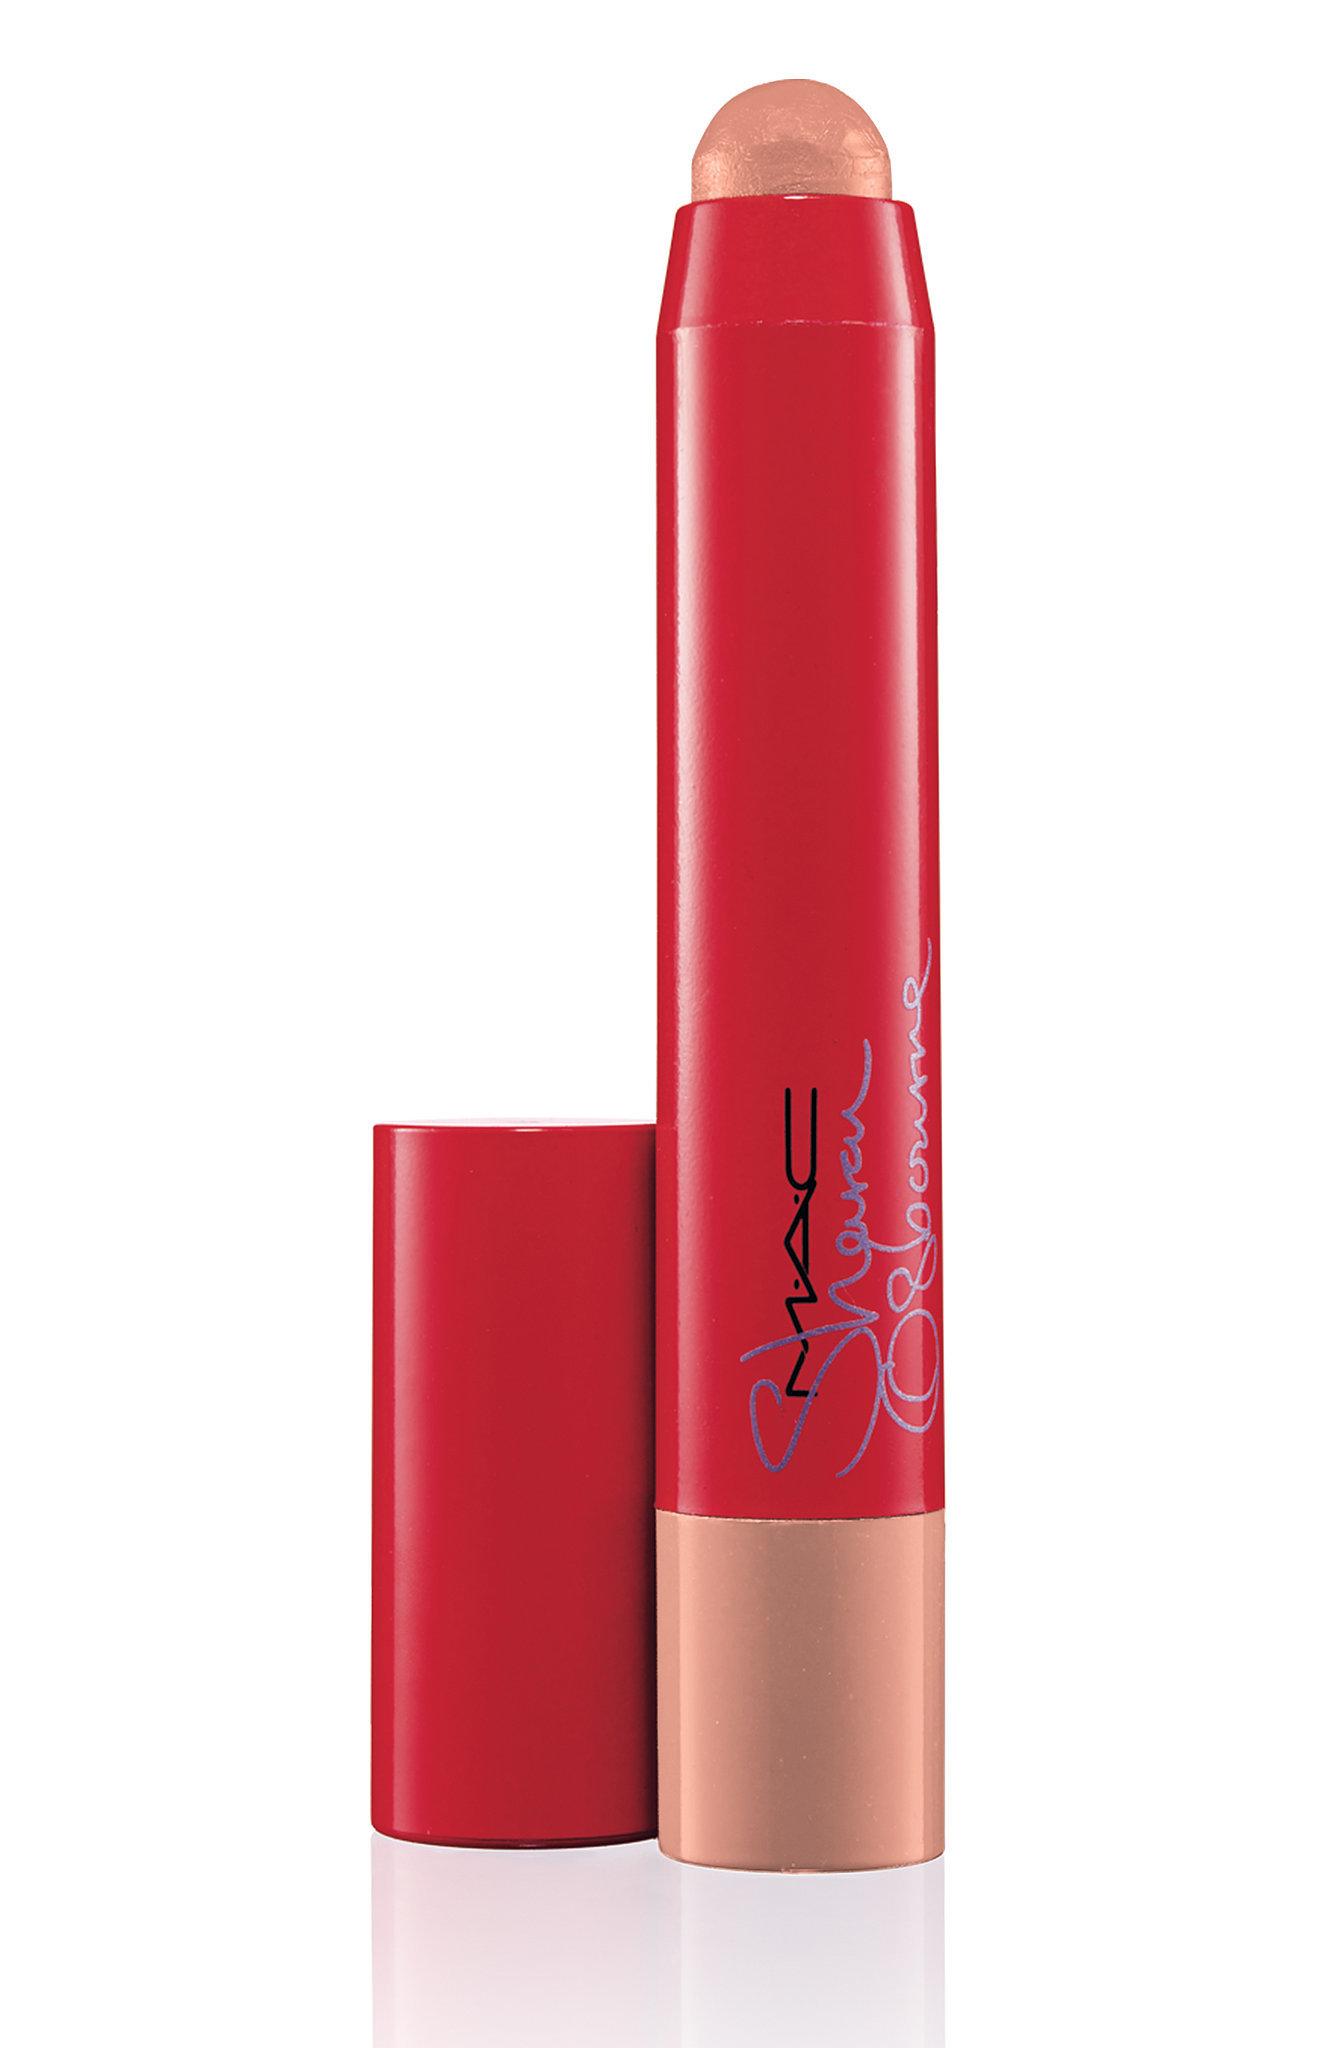 Sharon Osbourne Lip Pencil in Innocent ($22)